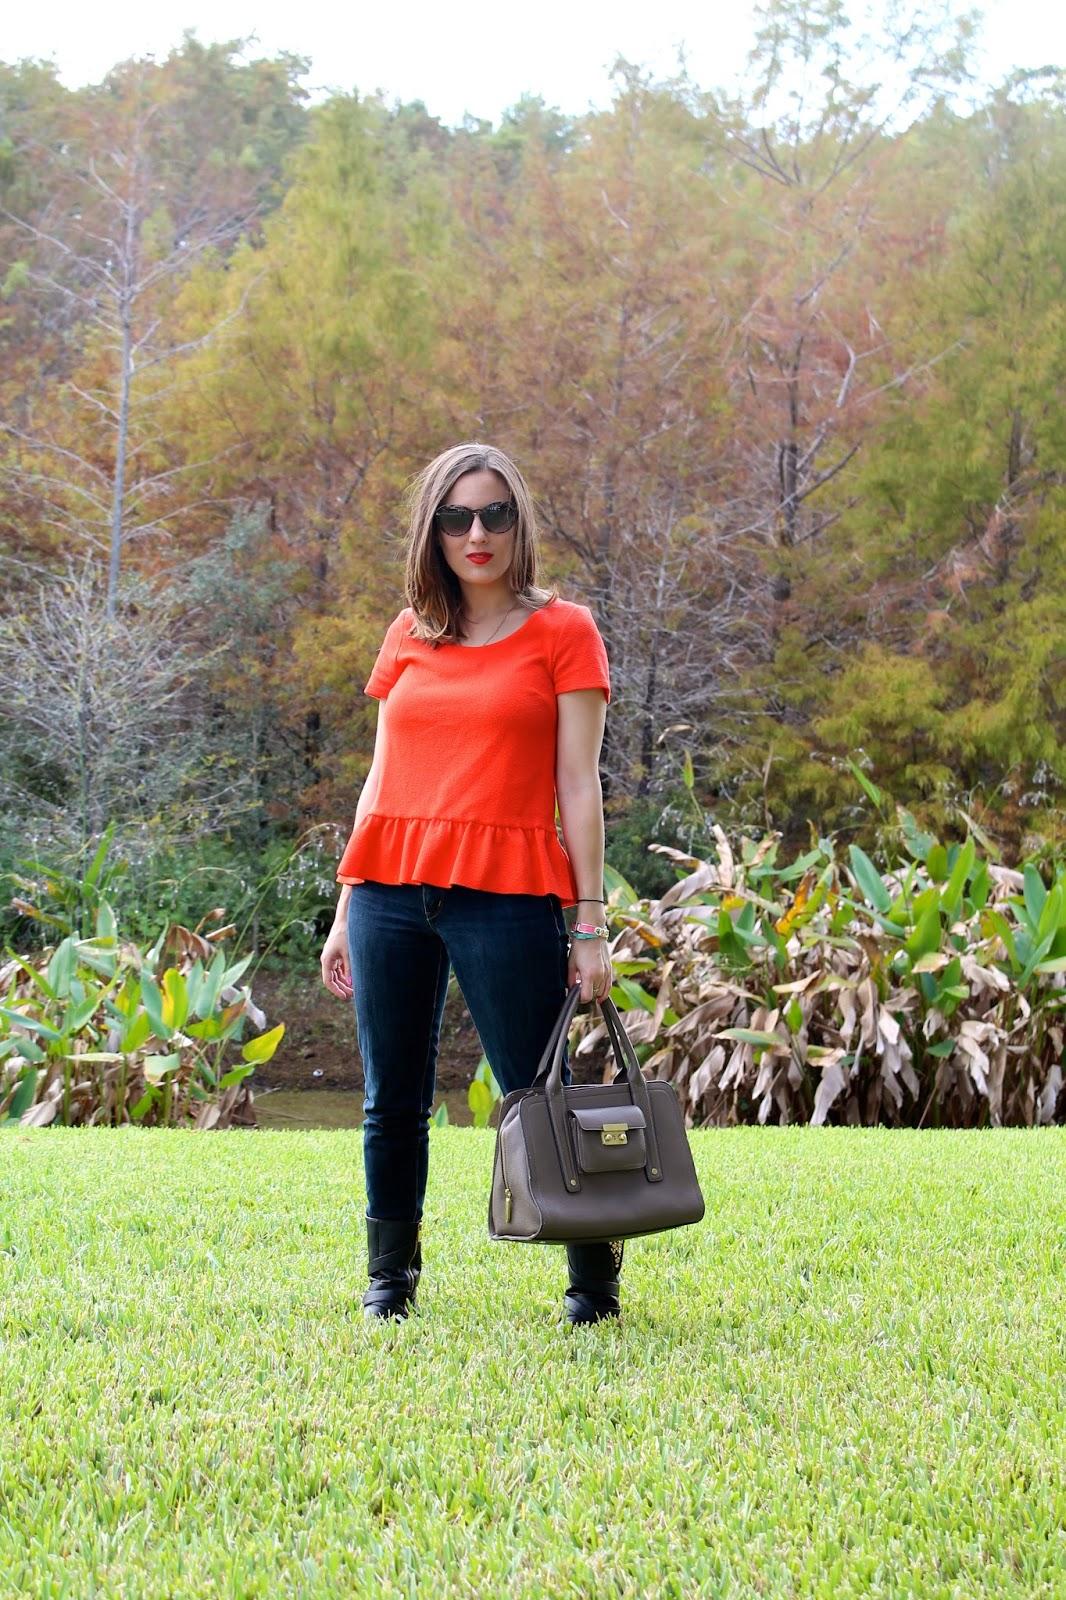 Anthropologie, jessica simpson, Levi's, nordstrom, T.J. Maxx, 3.1 Phillip Lim for Target, BCBGeneration, Charming Charlie, fashion blog, style blog, street style, lookbook